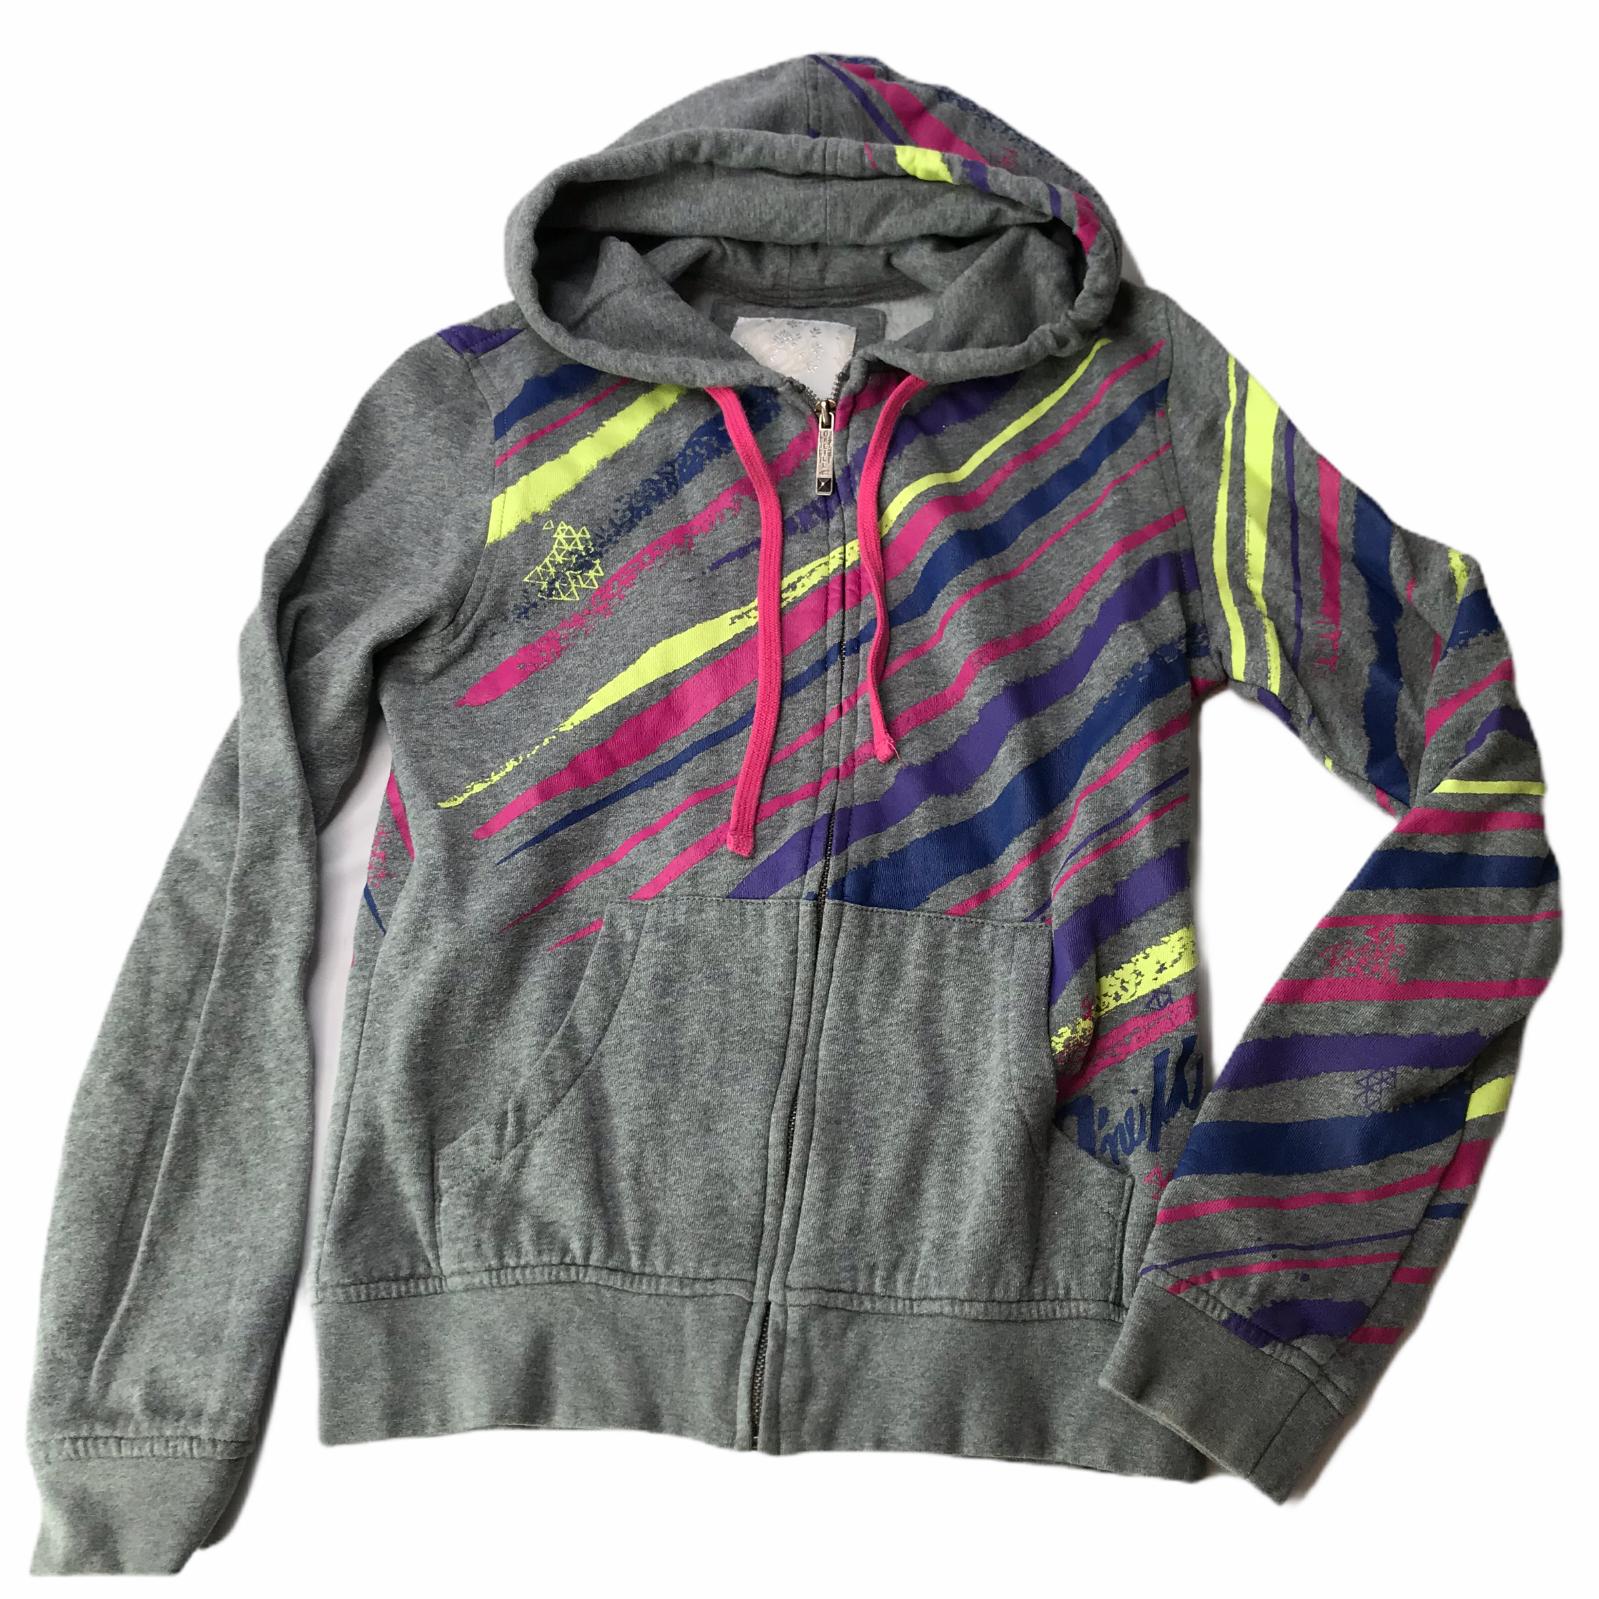 O'Neill Hooded Sweatshirt Hoodie Jacket Full Zip Gray Pink Stripes Small